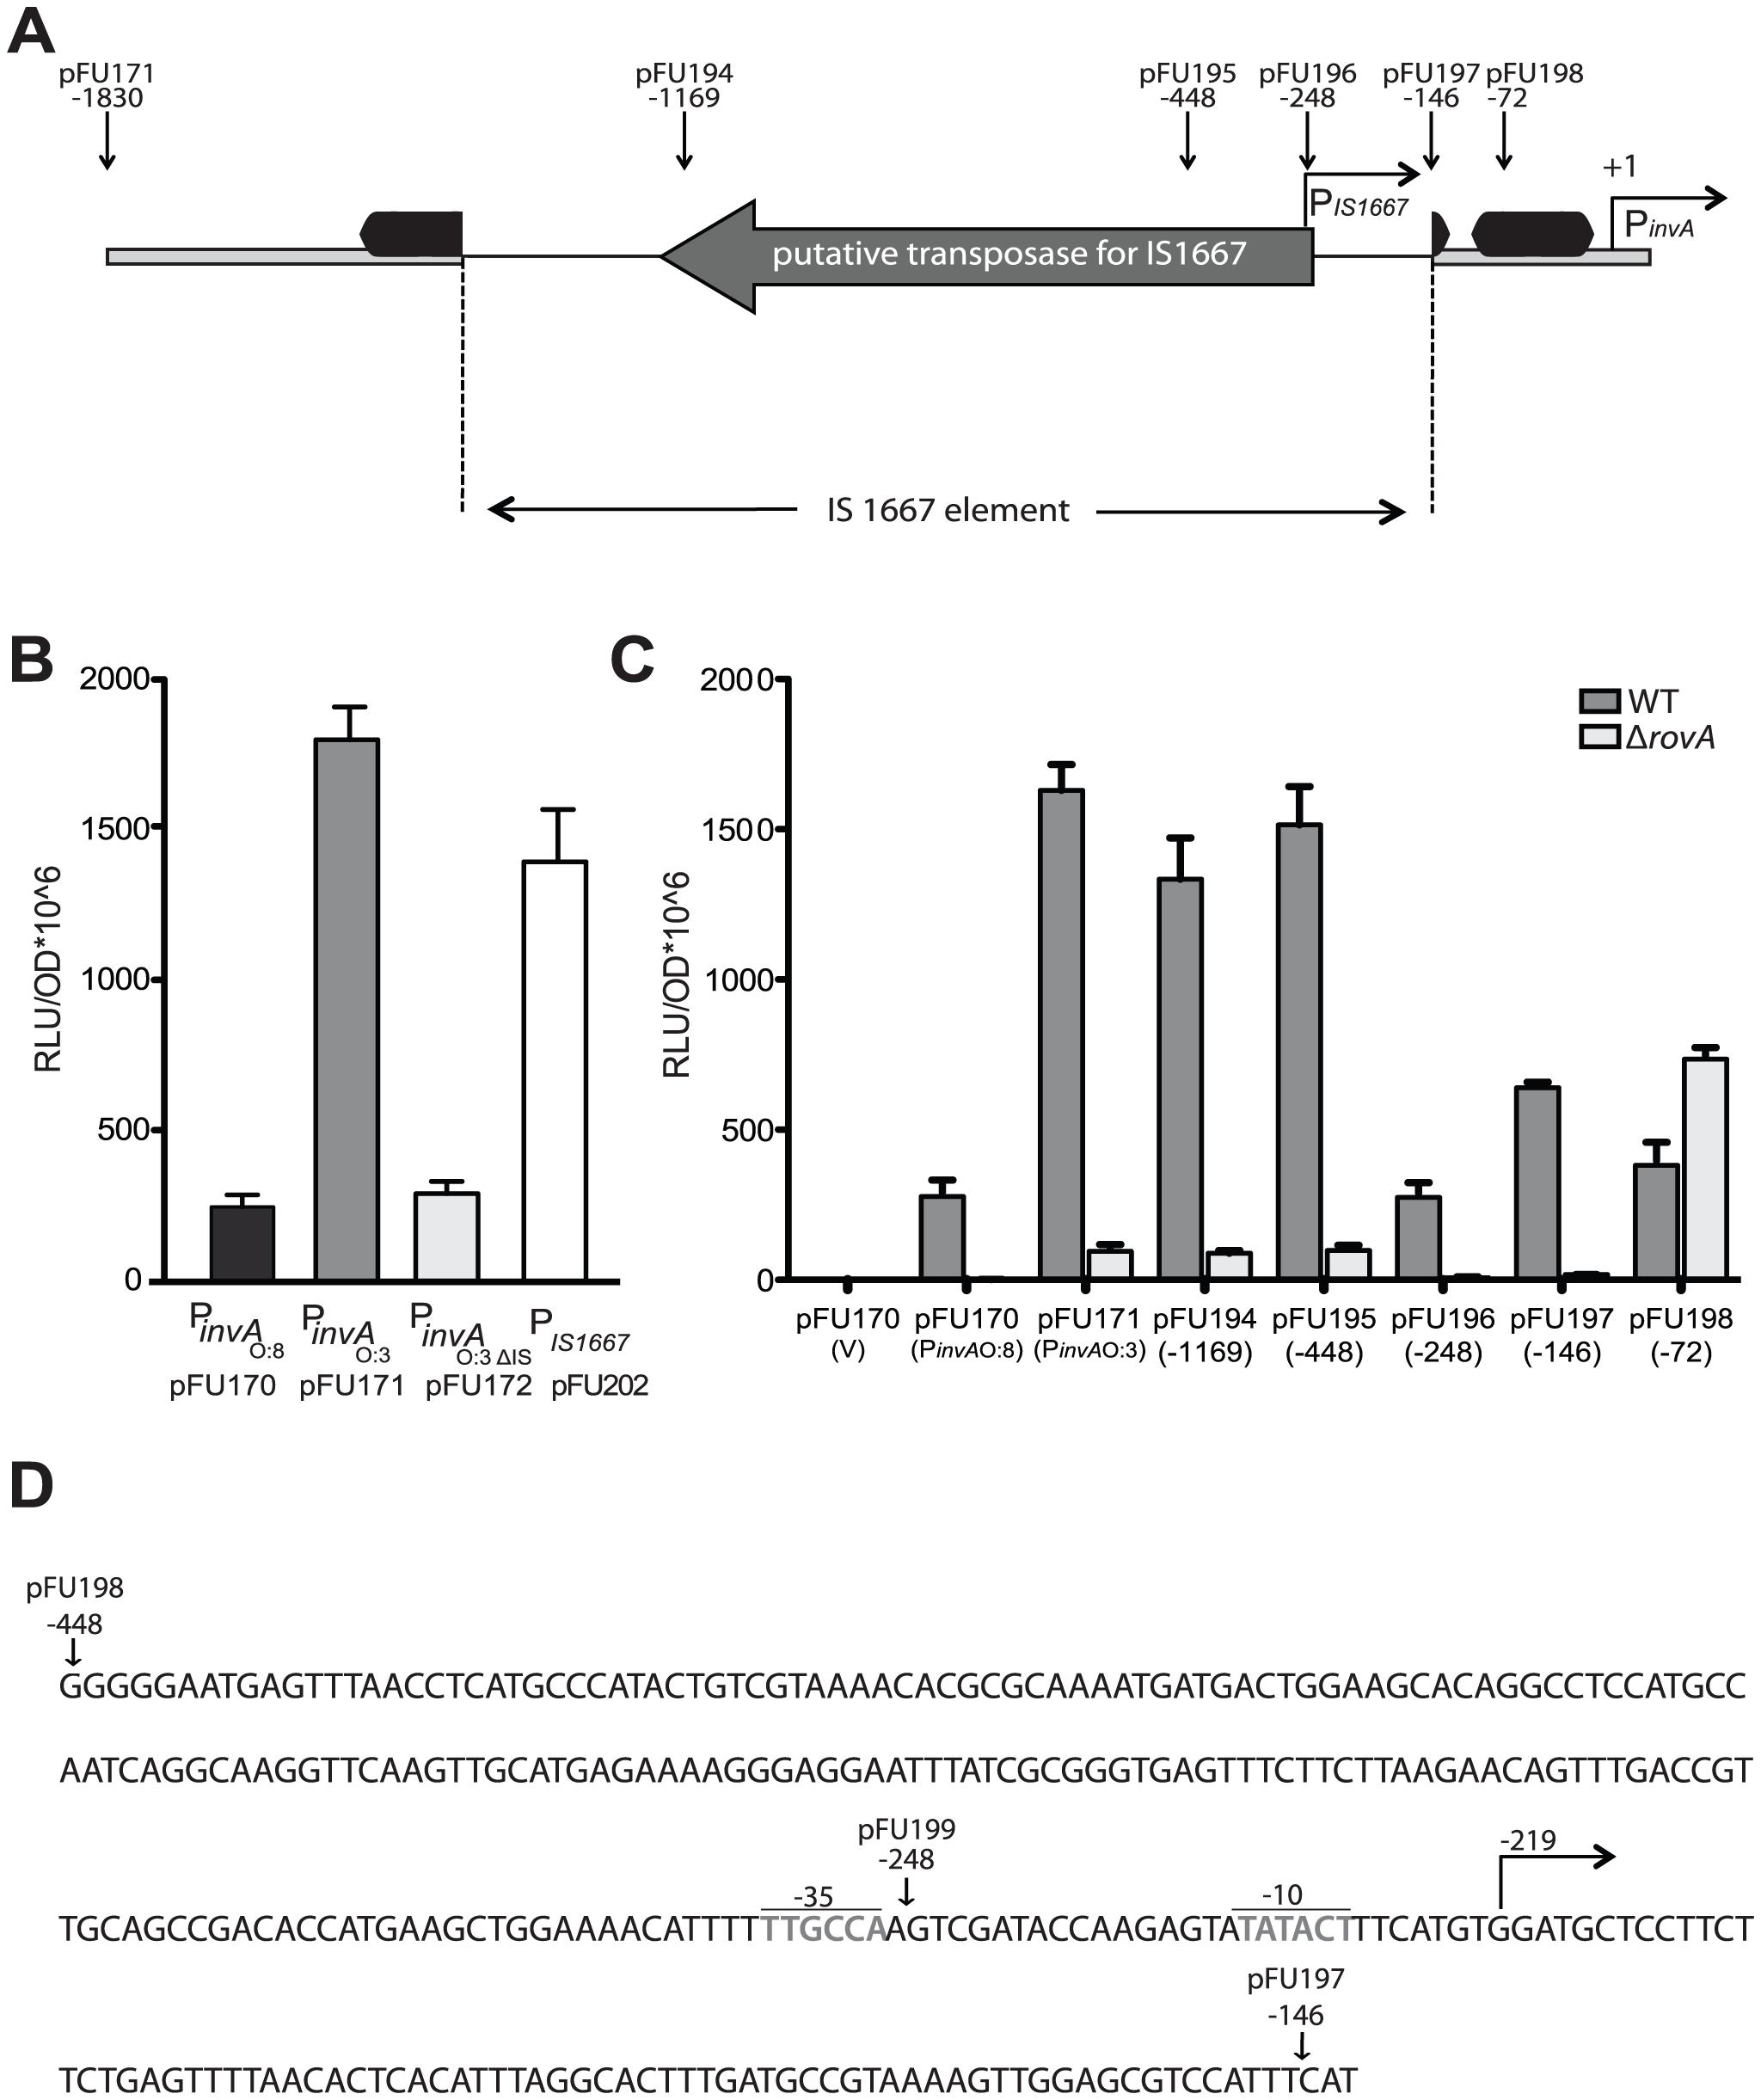 Analysis of <i>invA</i> expression in <i>Y. enterocolitica</i> O:3.